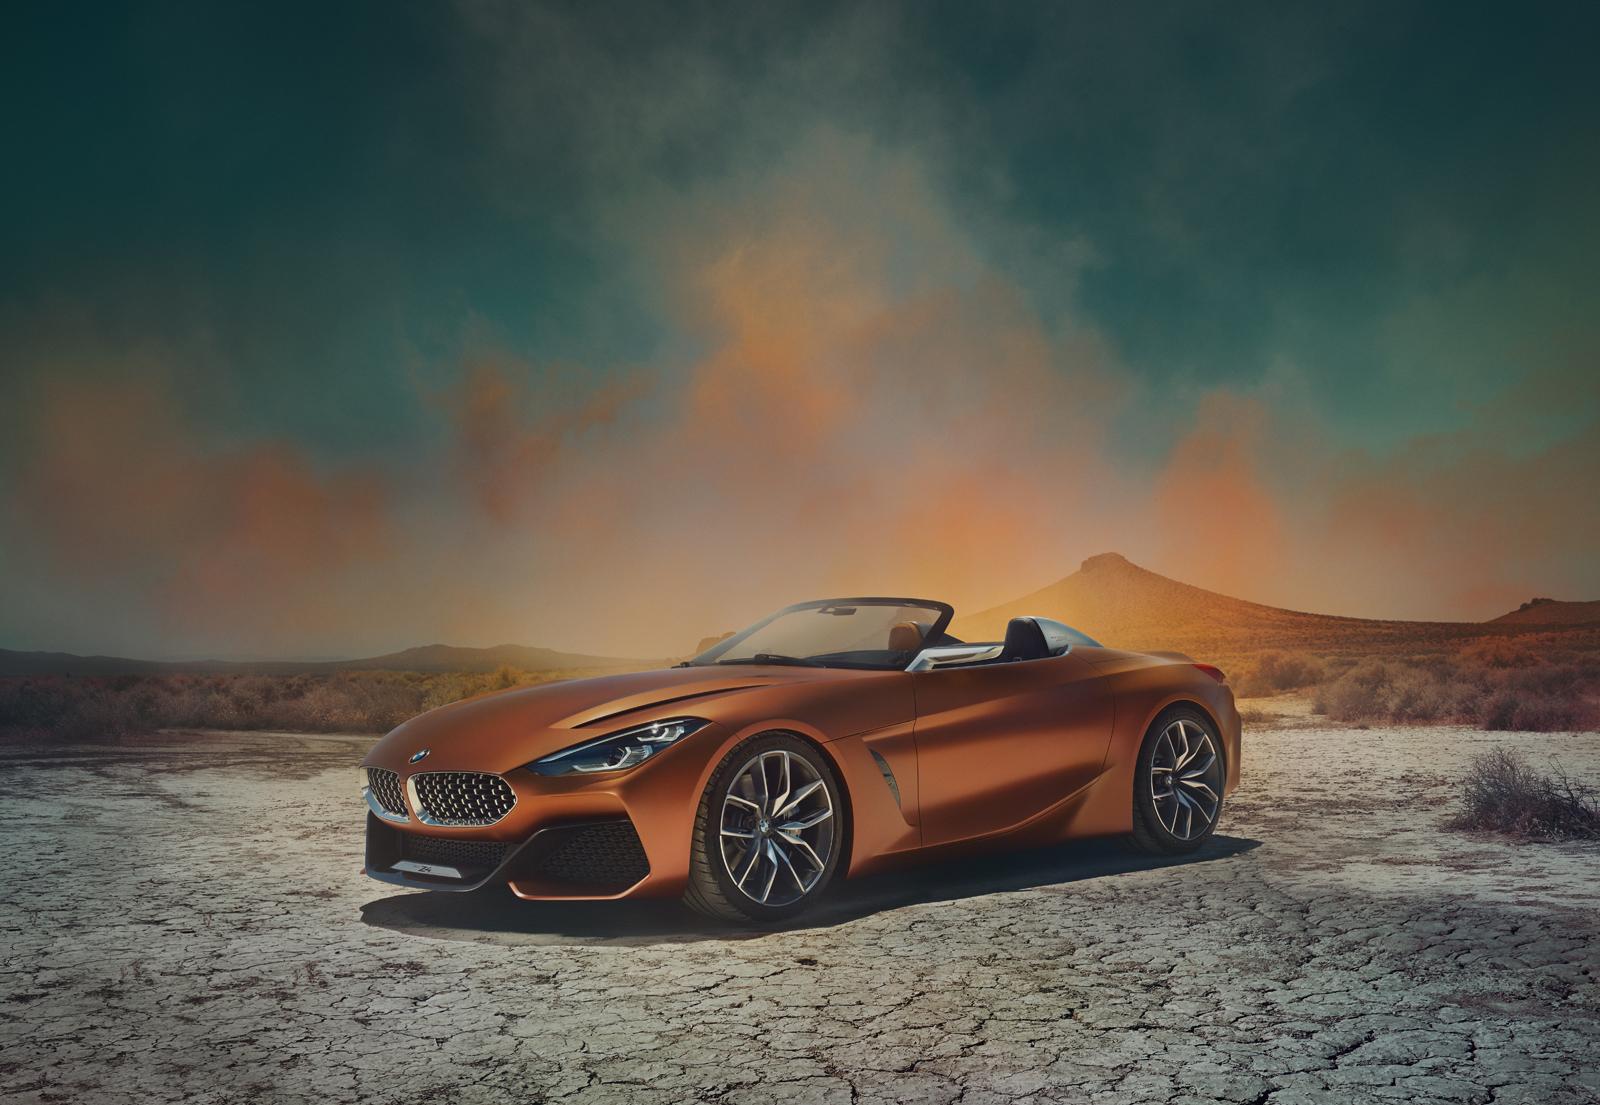 BMW_DCC070_27.jpg